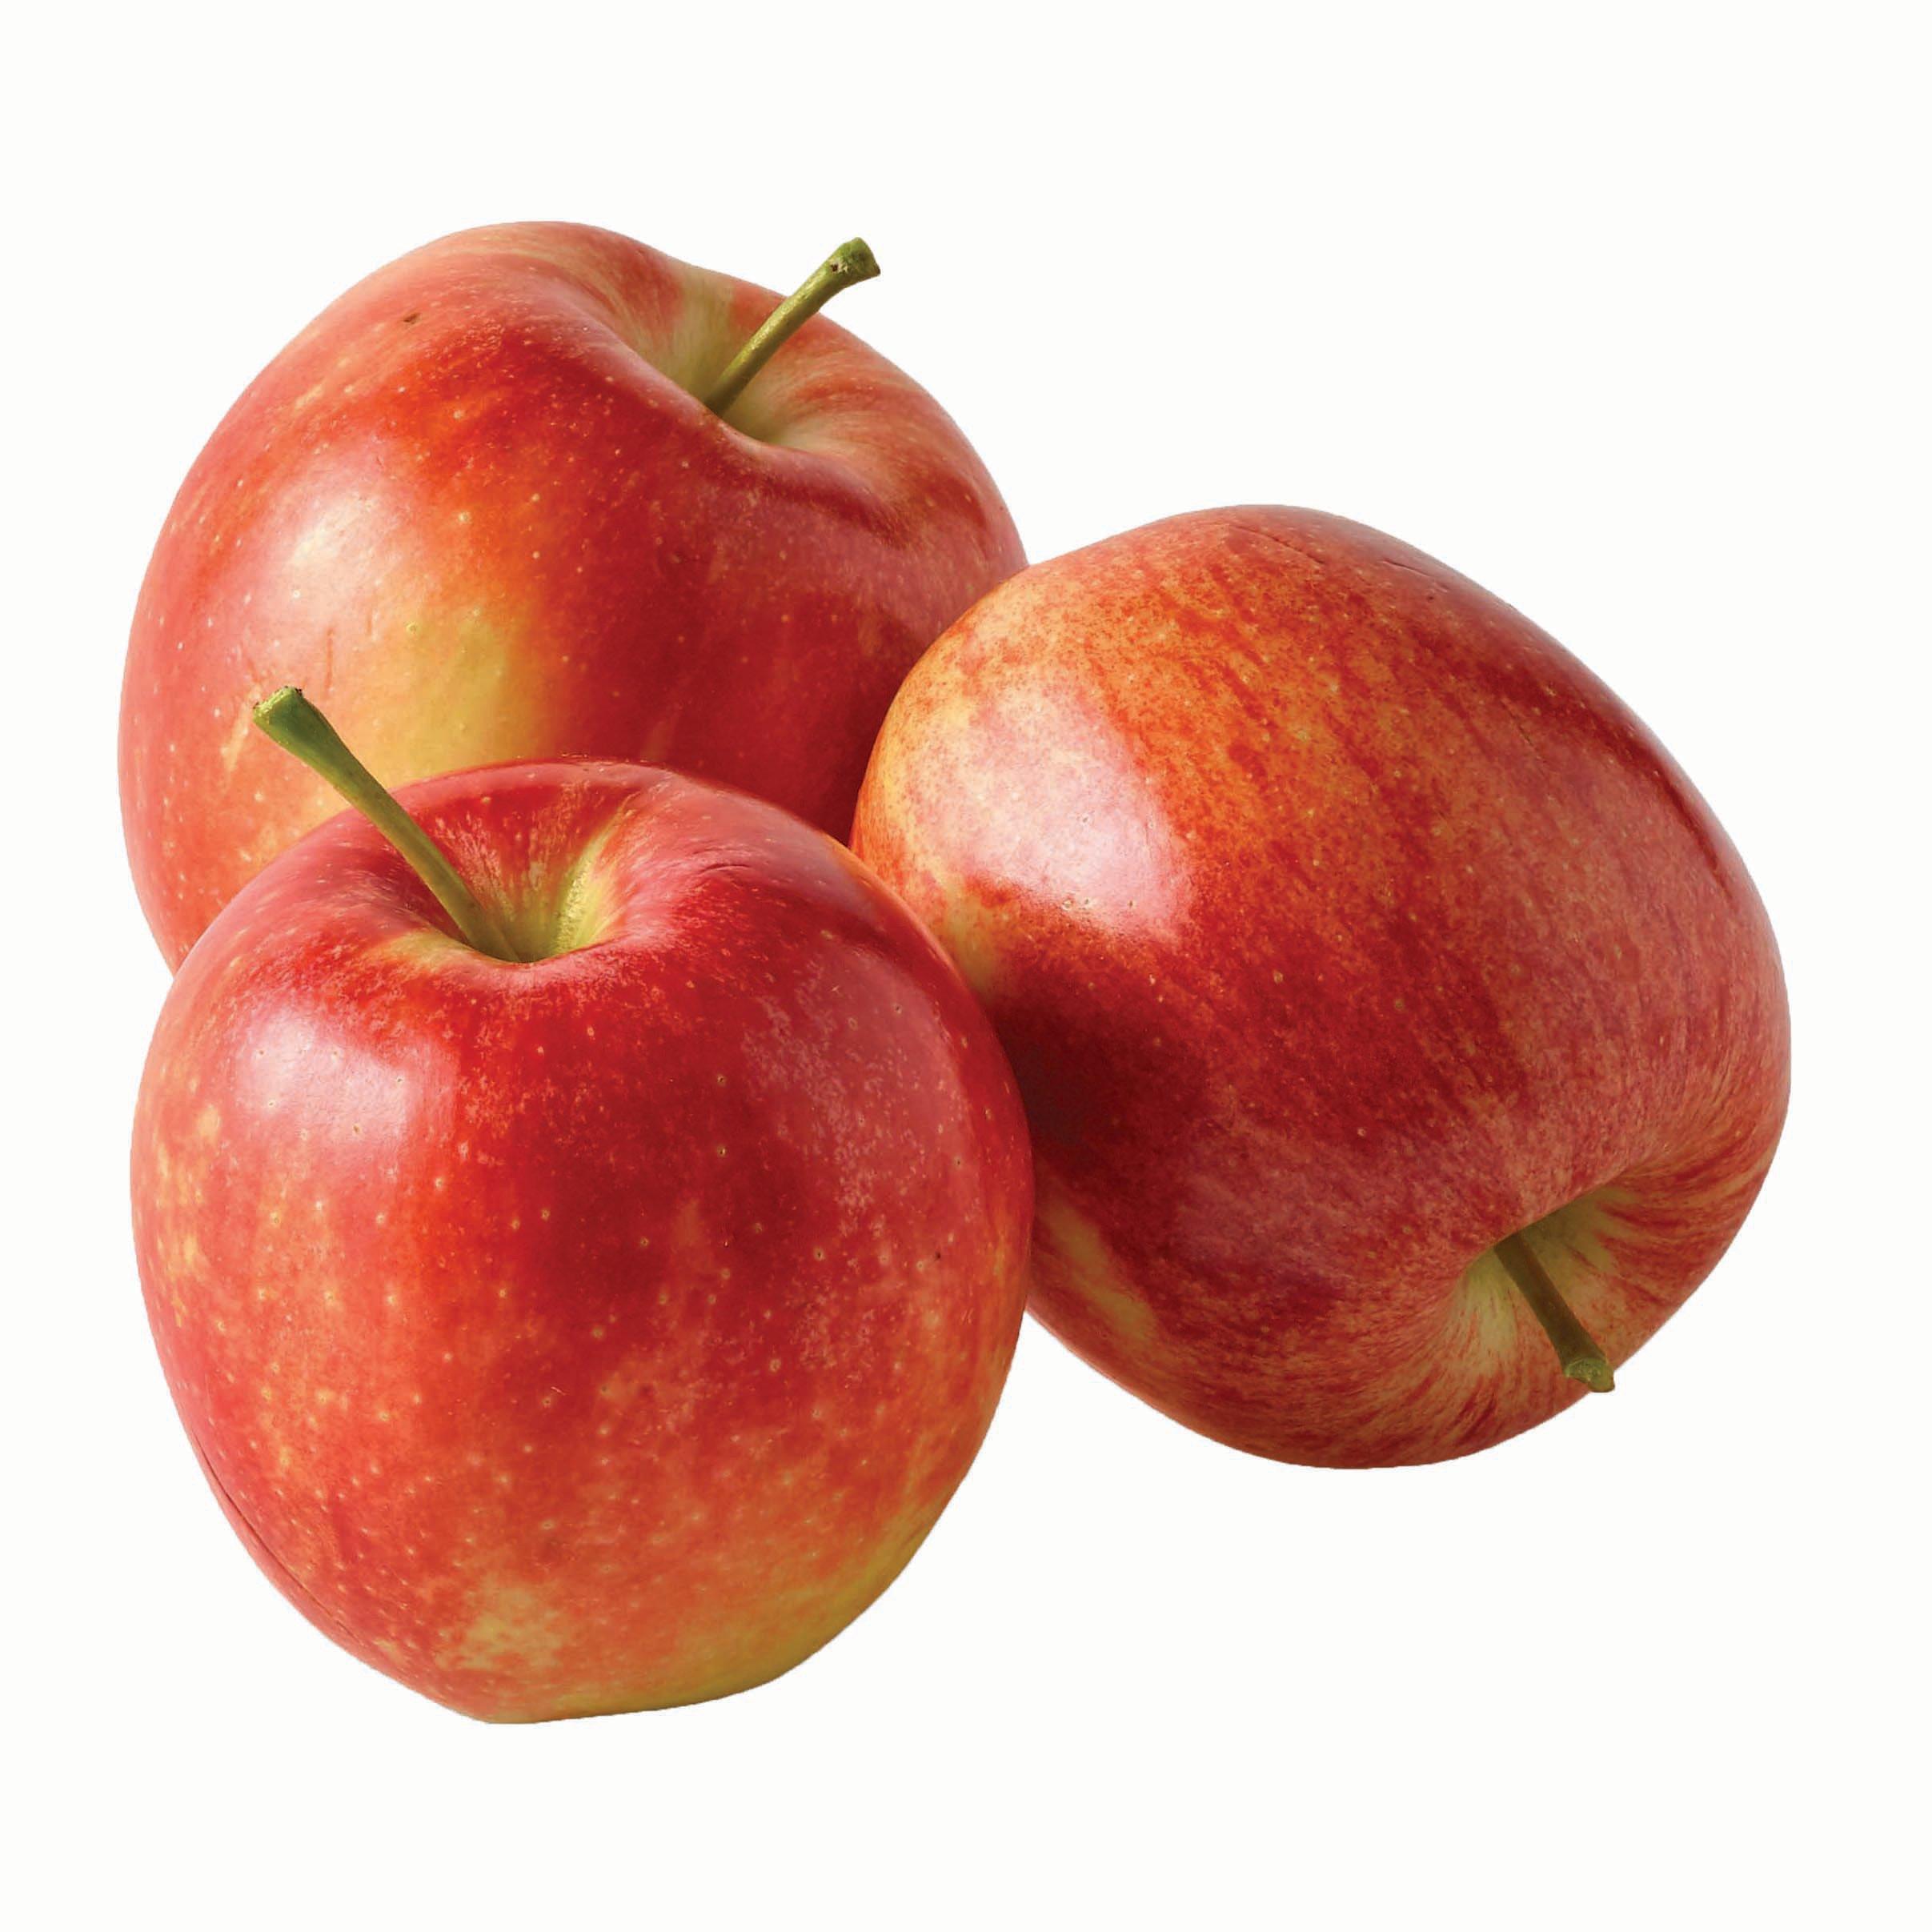 Fresh Gala Apples Shop Apples At H E B